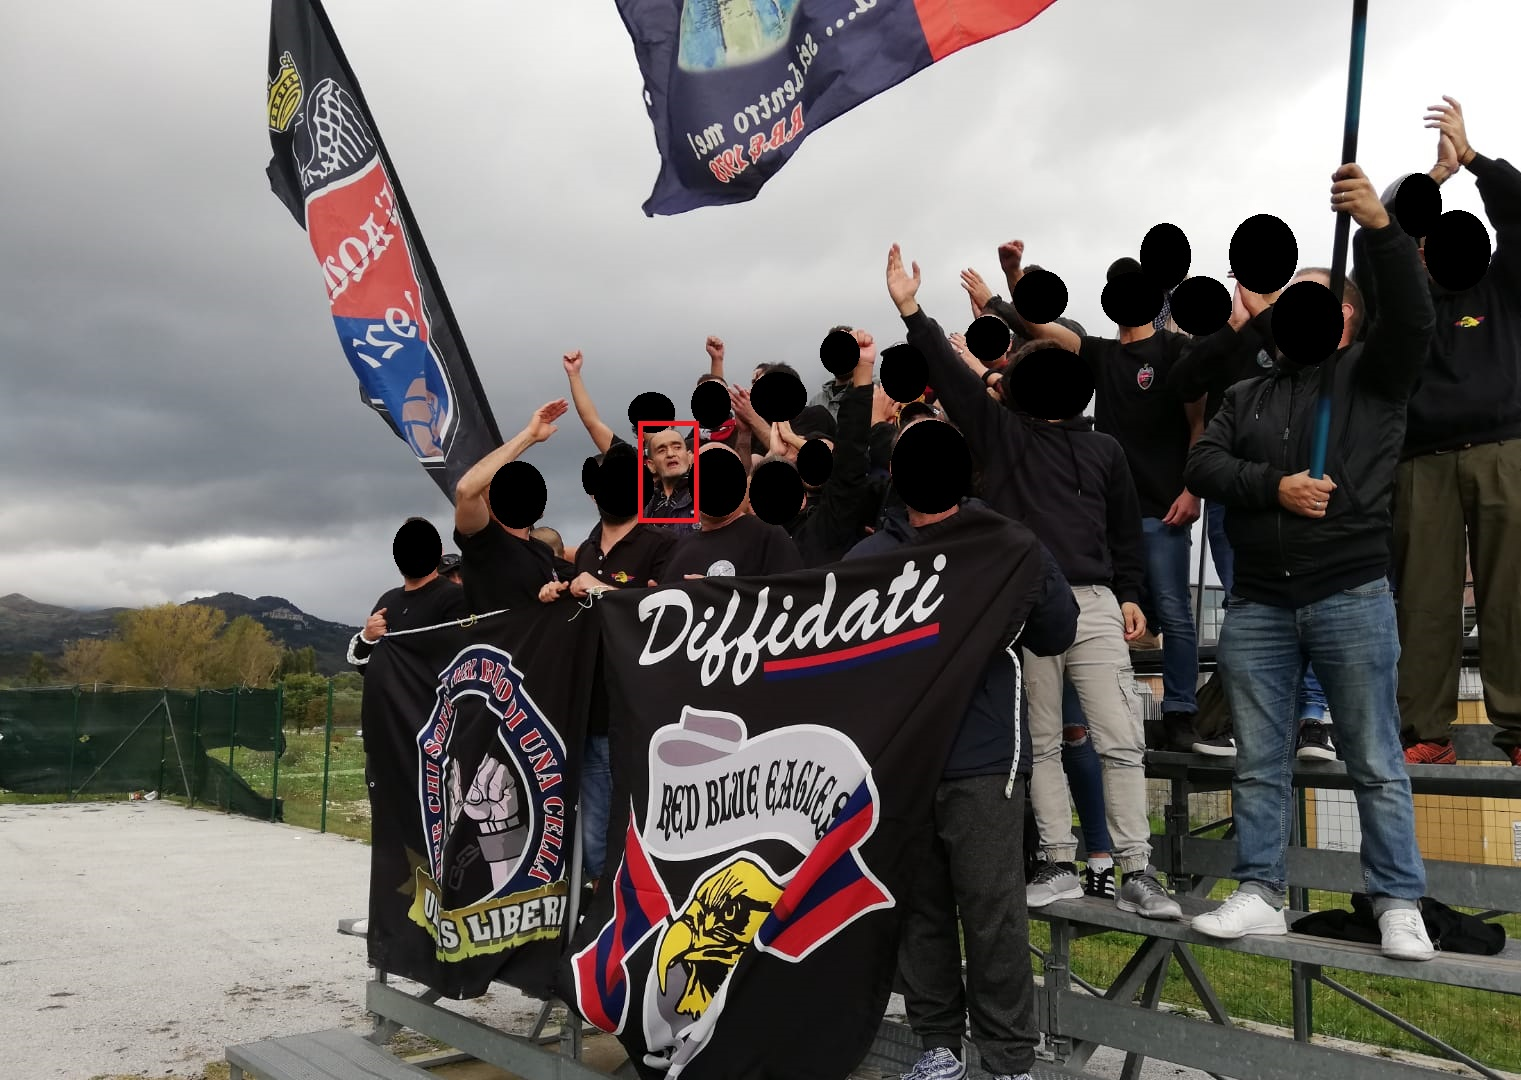 Villetta Barrea-L'Aquila-7-10-2018 Prima Categoria